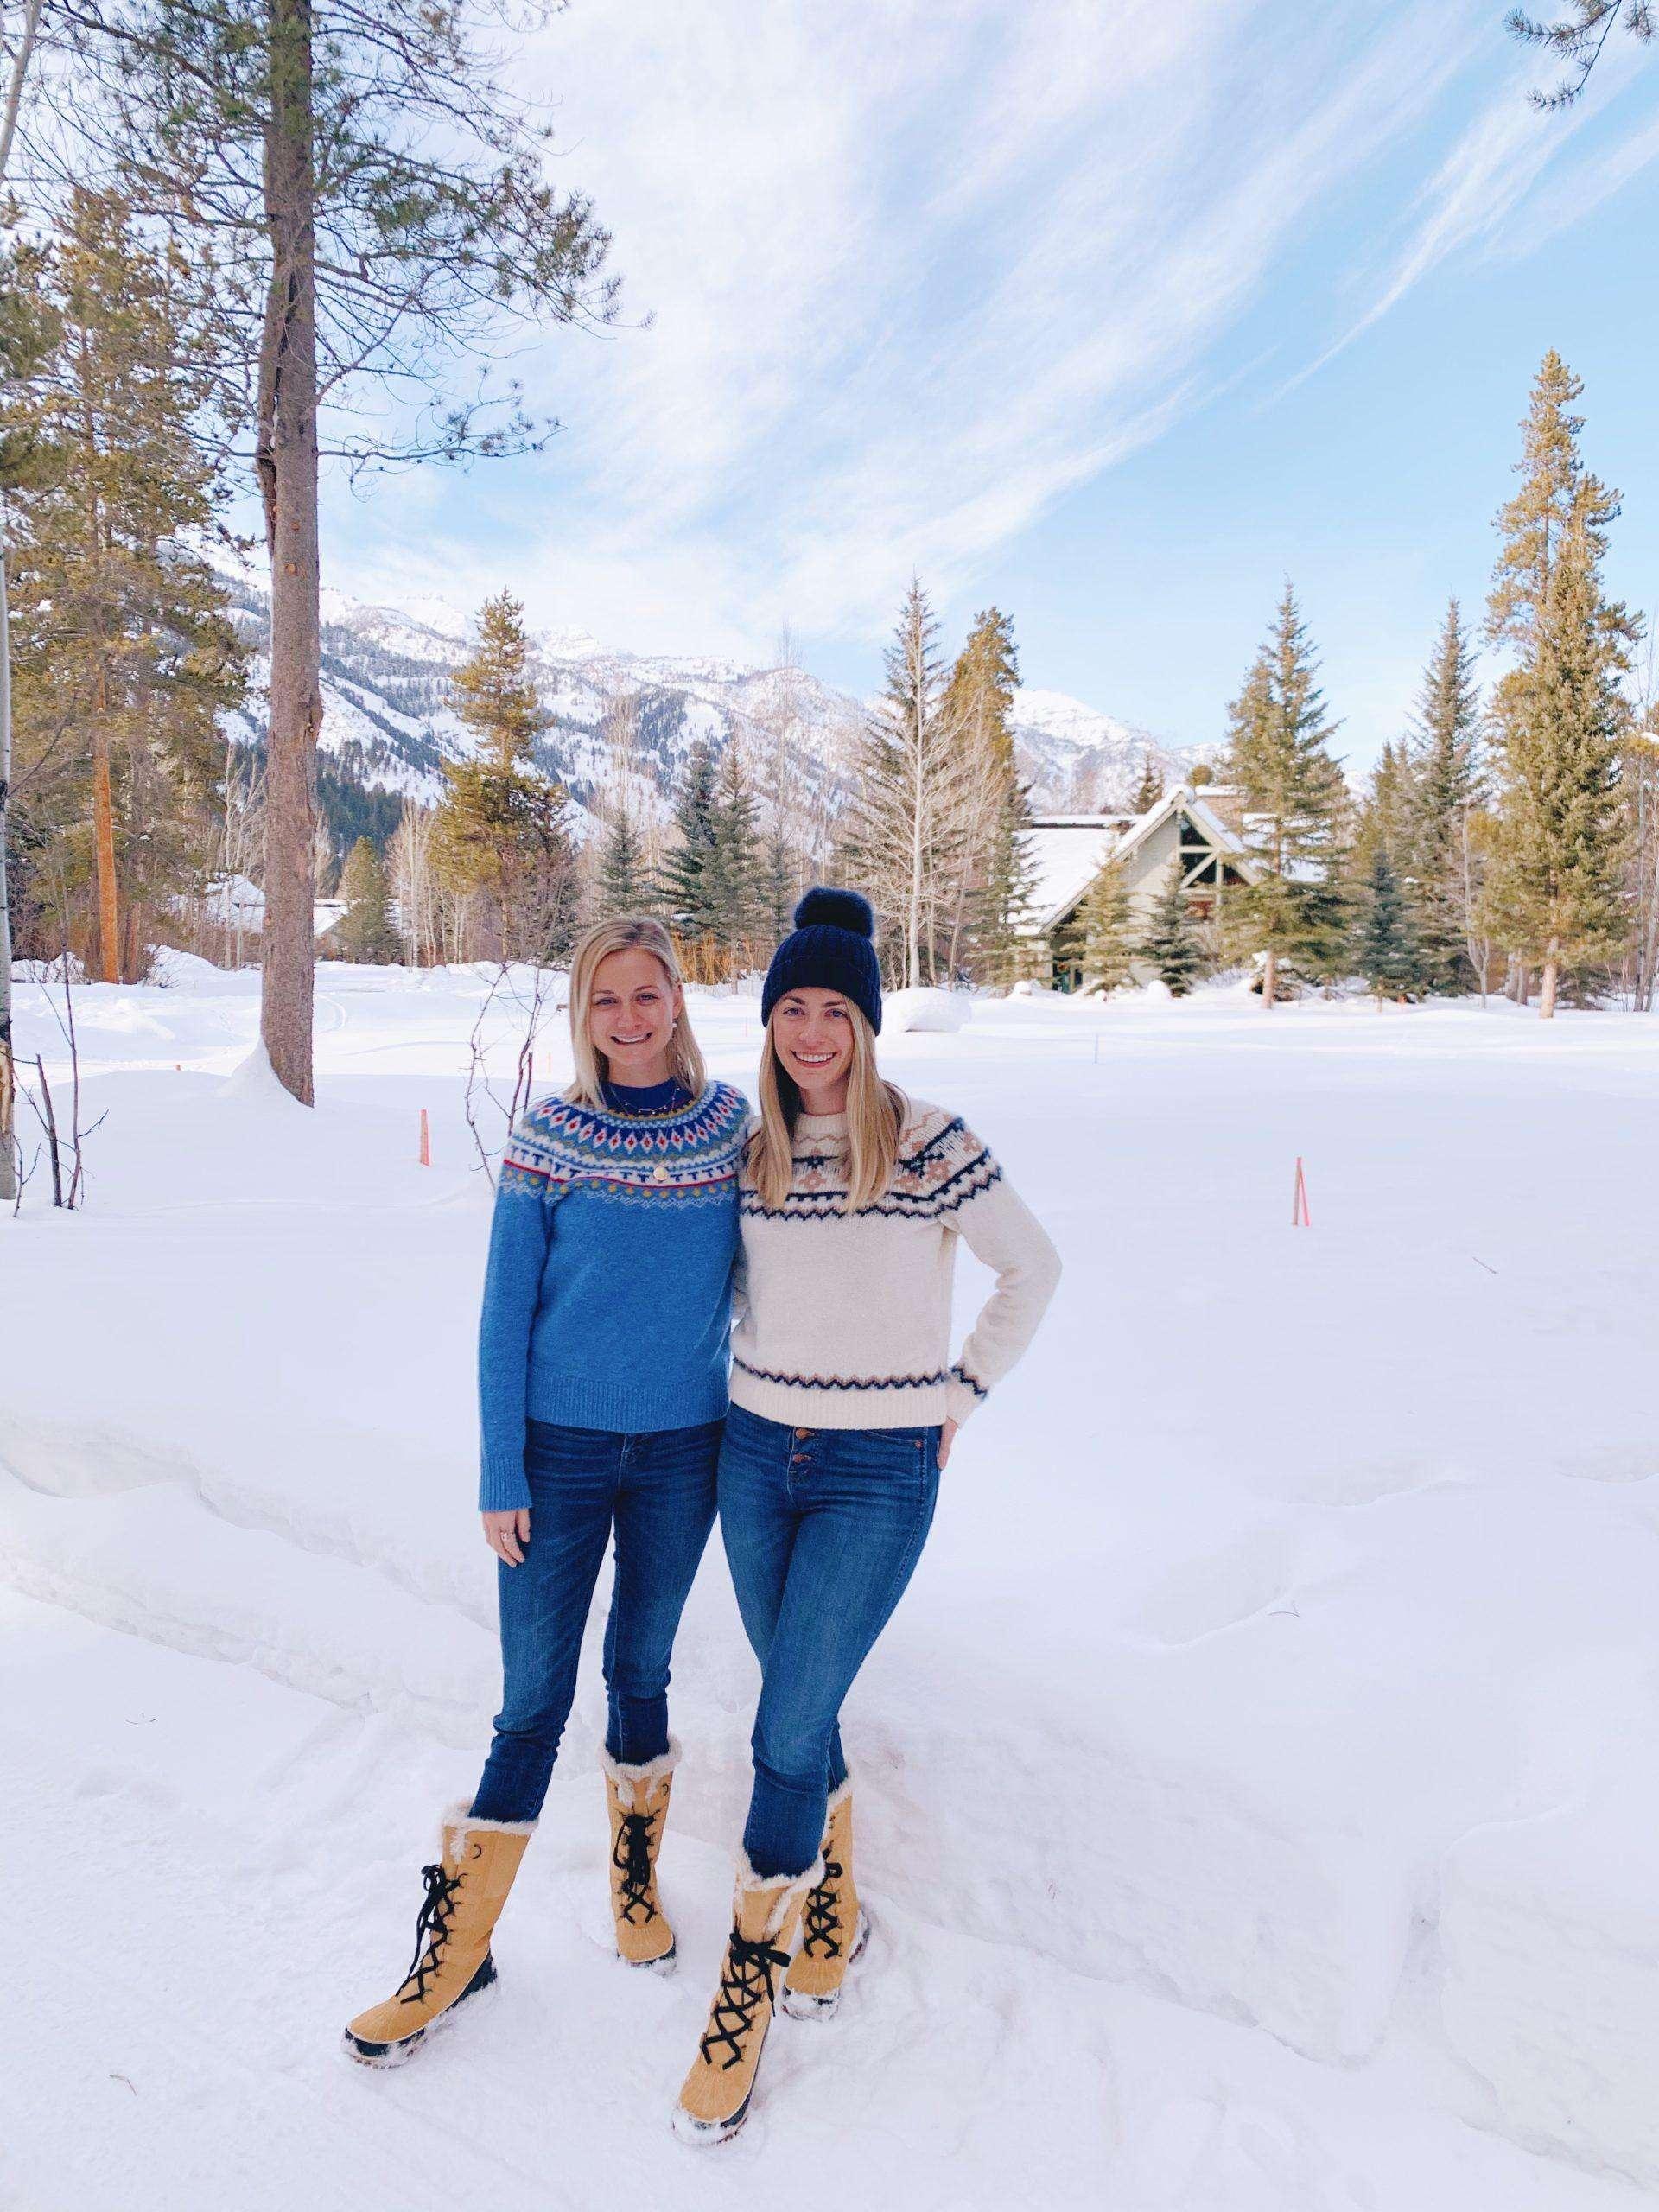 fair Isle Sweaters in Jackson Hole + Weekend Reads, No. 119 | Rhyme & Reason